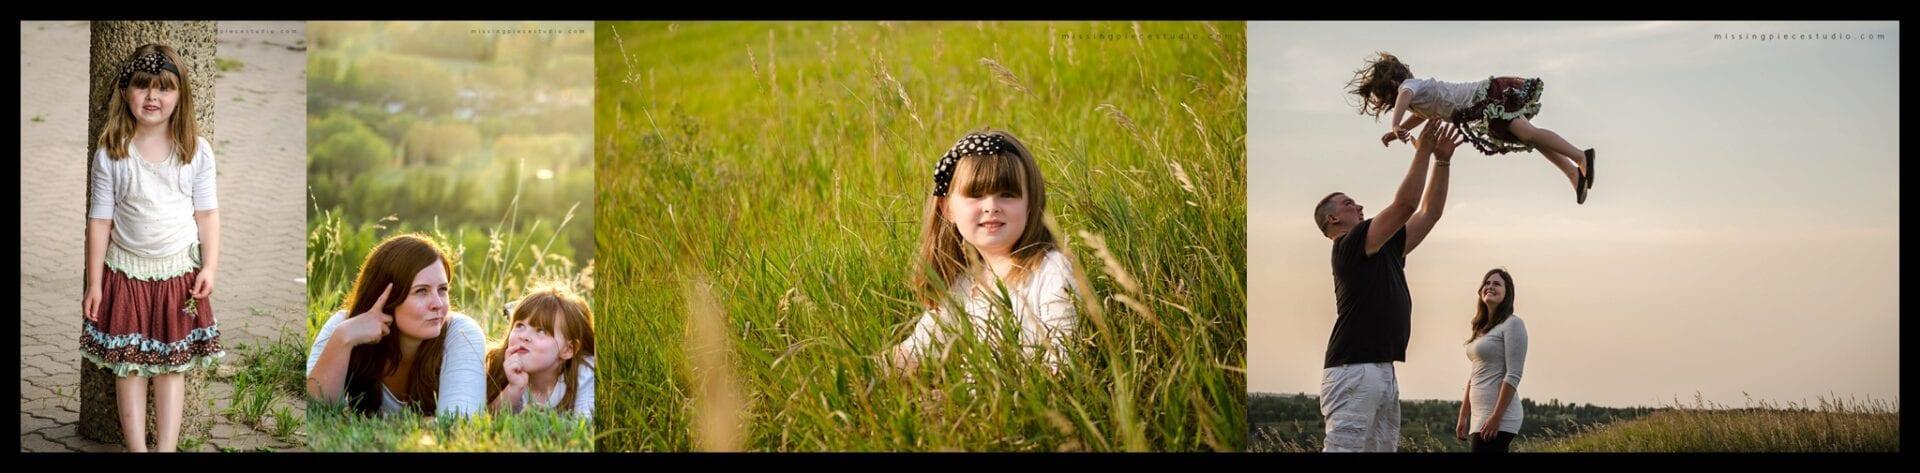 Edmonton Family Portrait Photography Candid-collage015